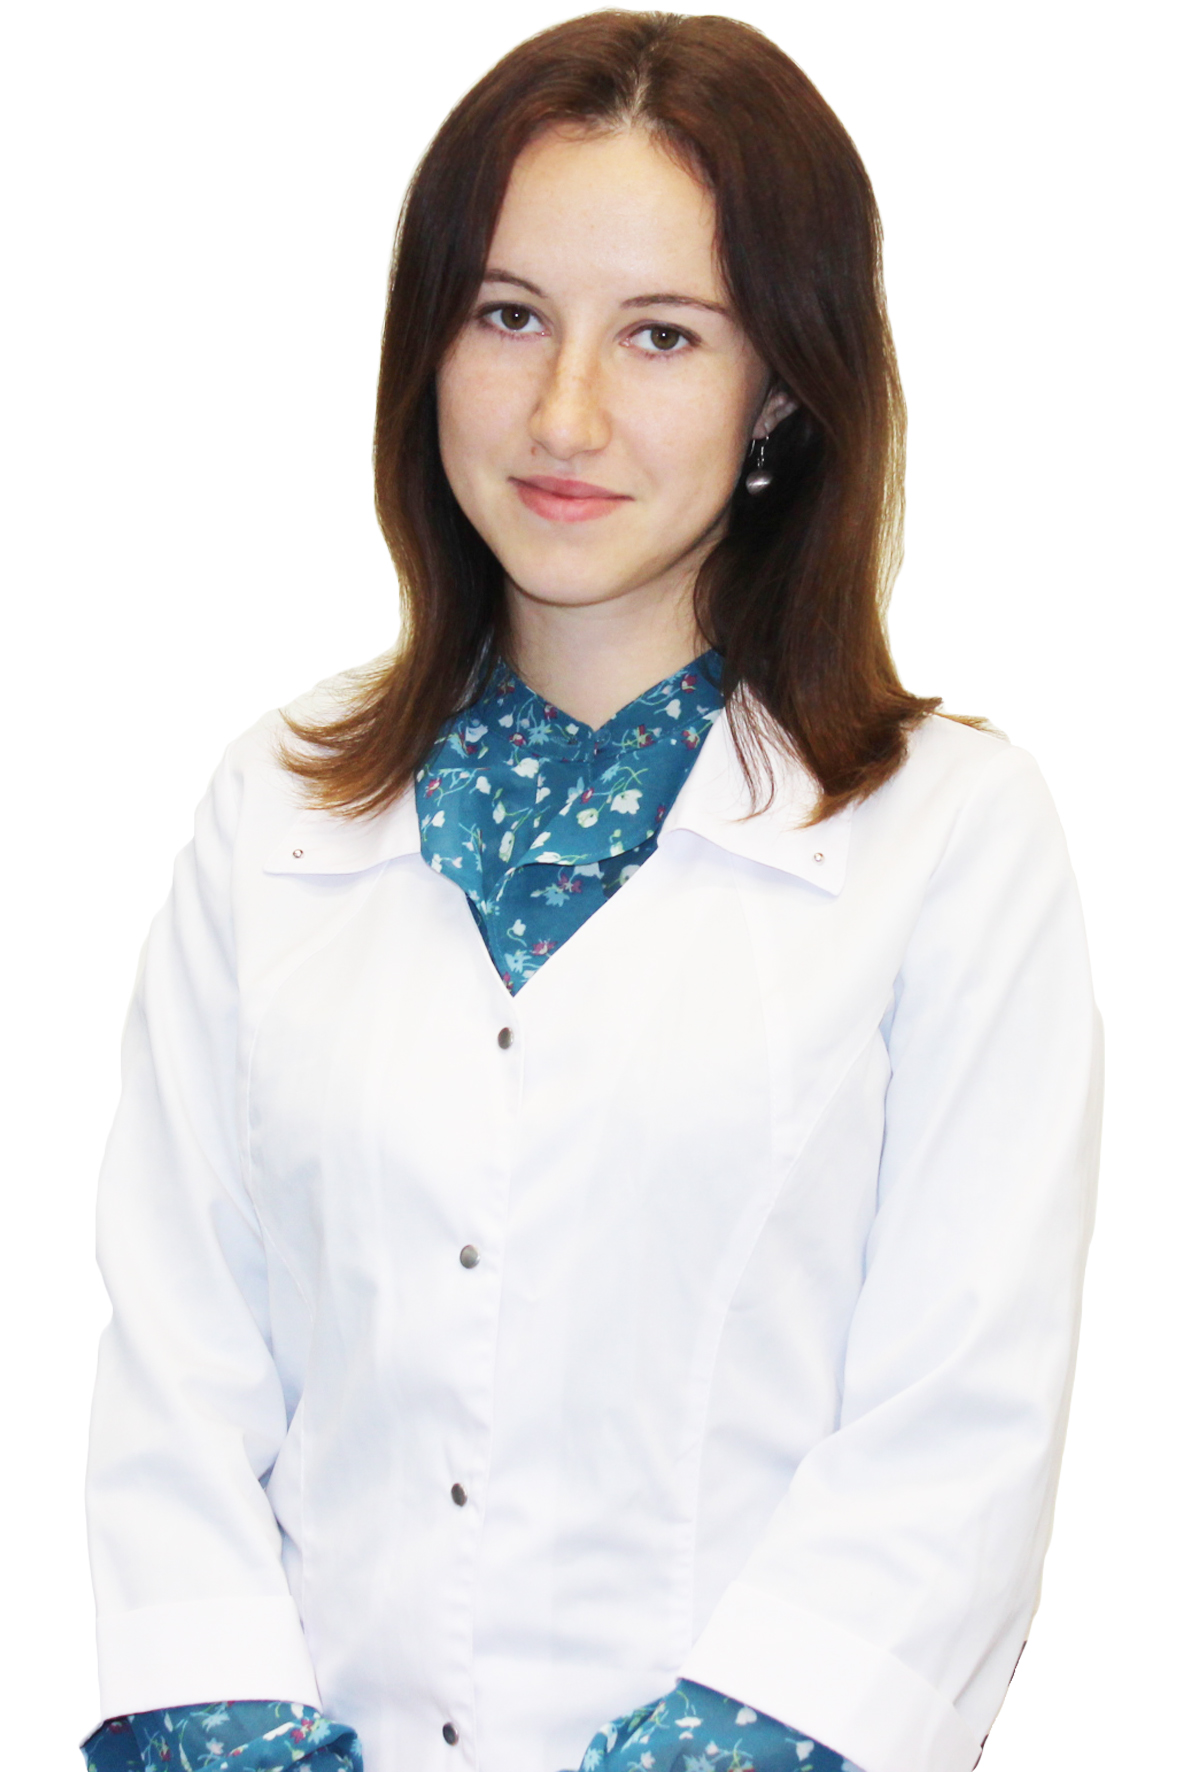 Савельева Мария Андреевна